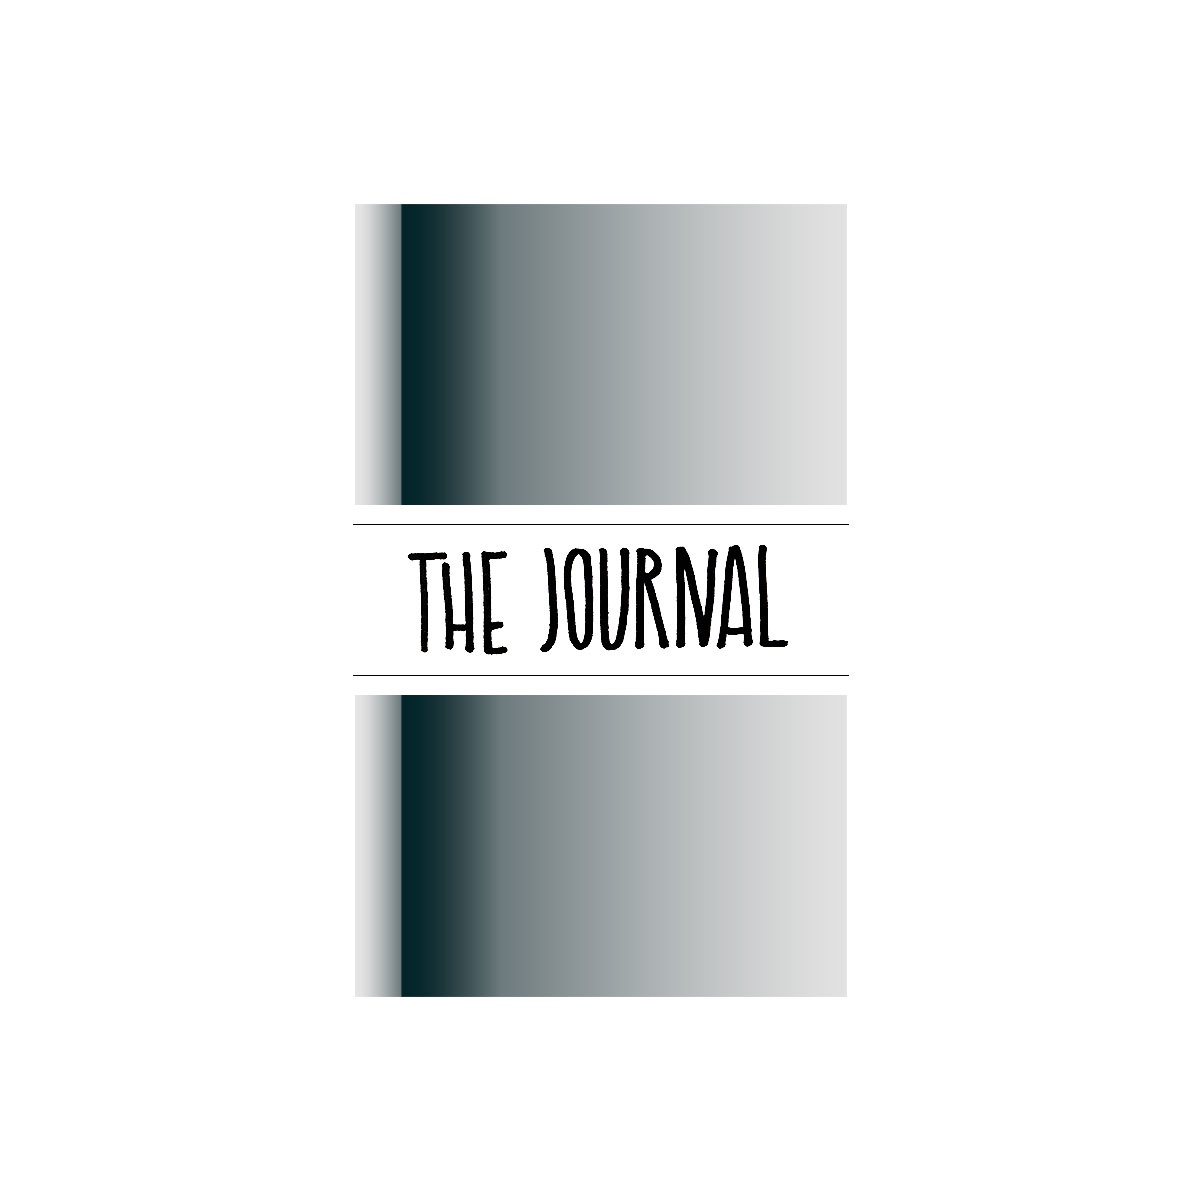 Maxgoodz Ежедневник The Journal Глянцевый Хром, 2 тетради, A5